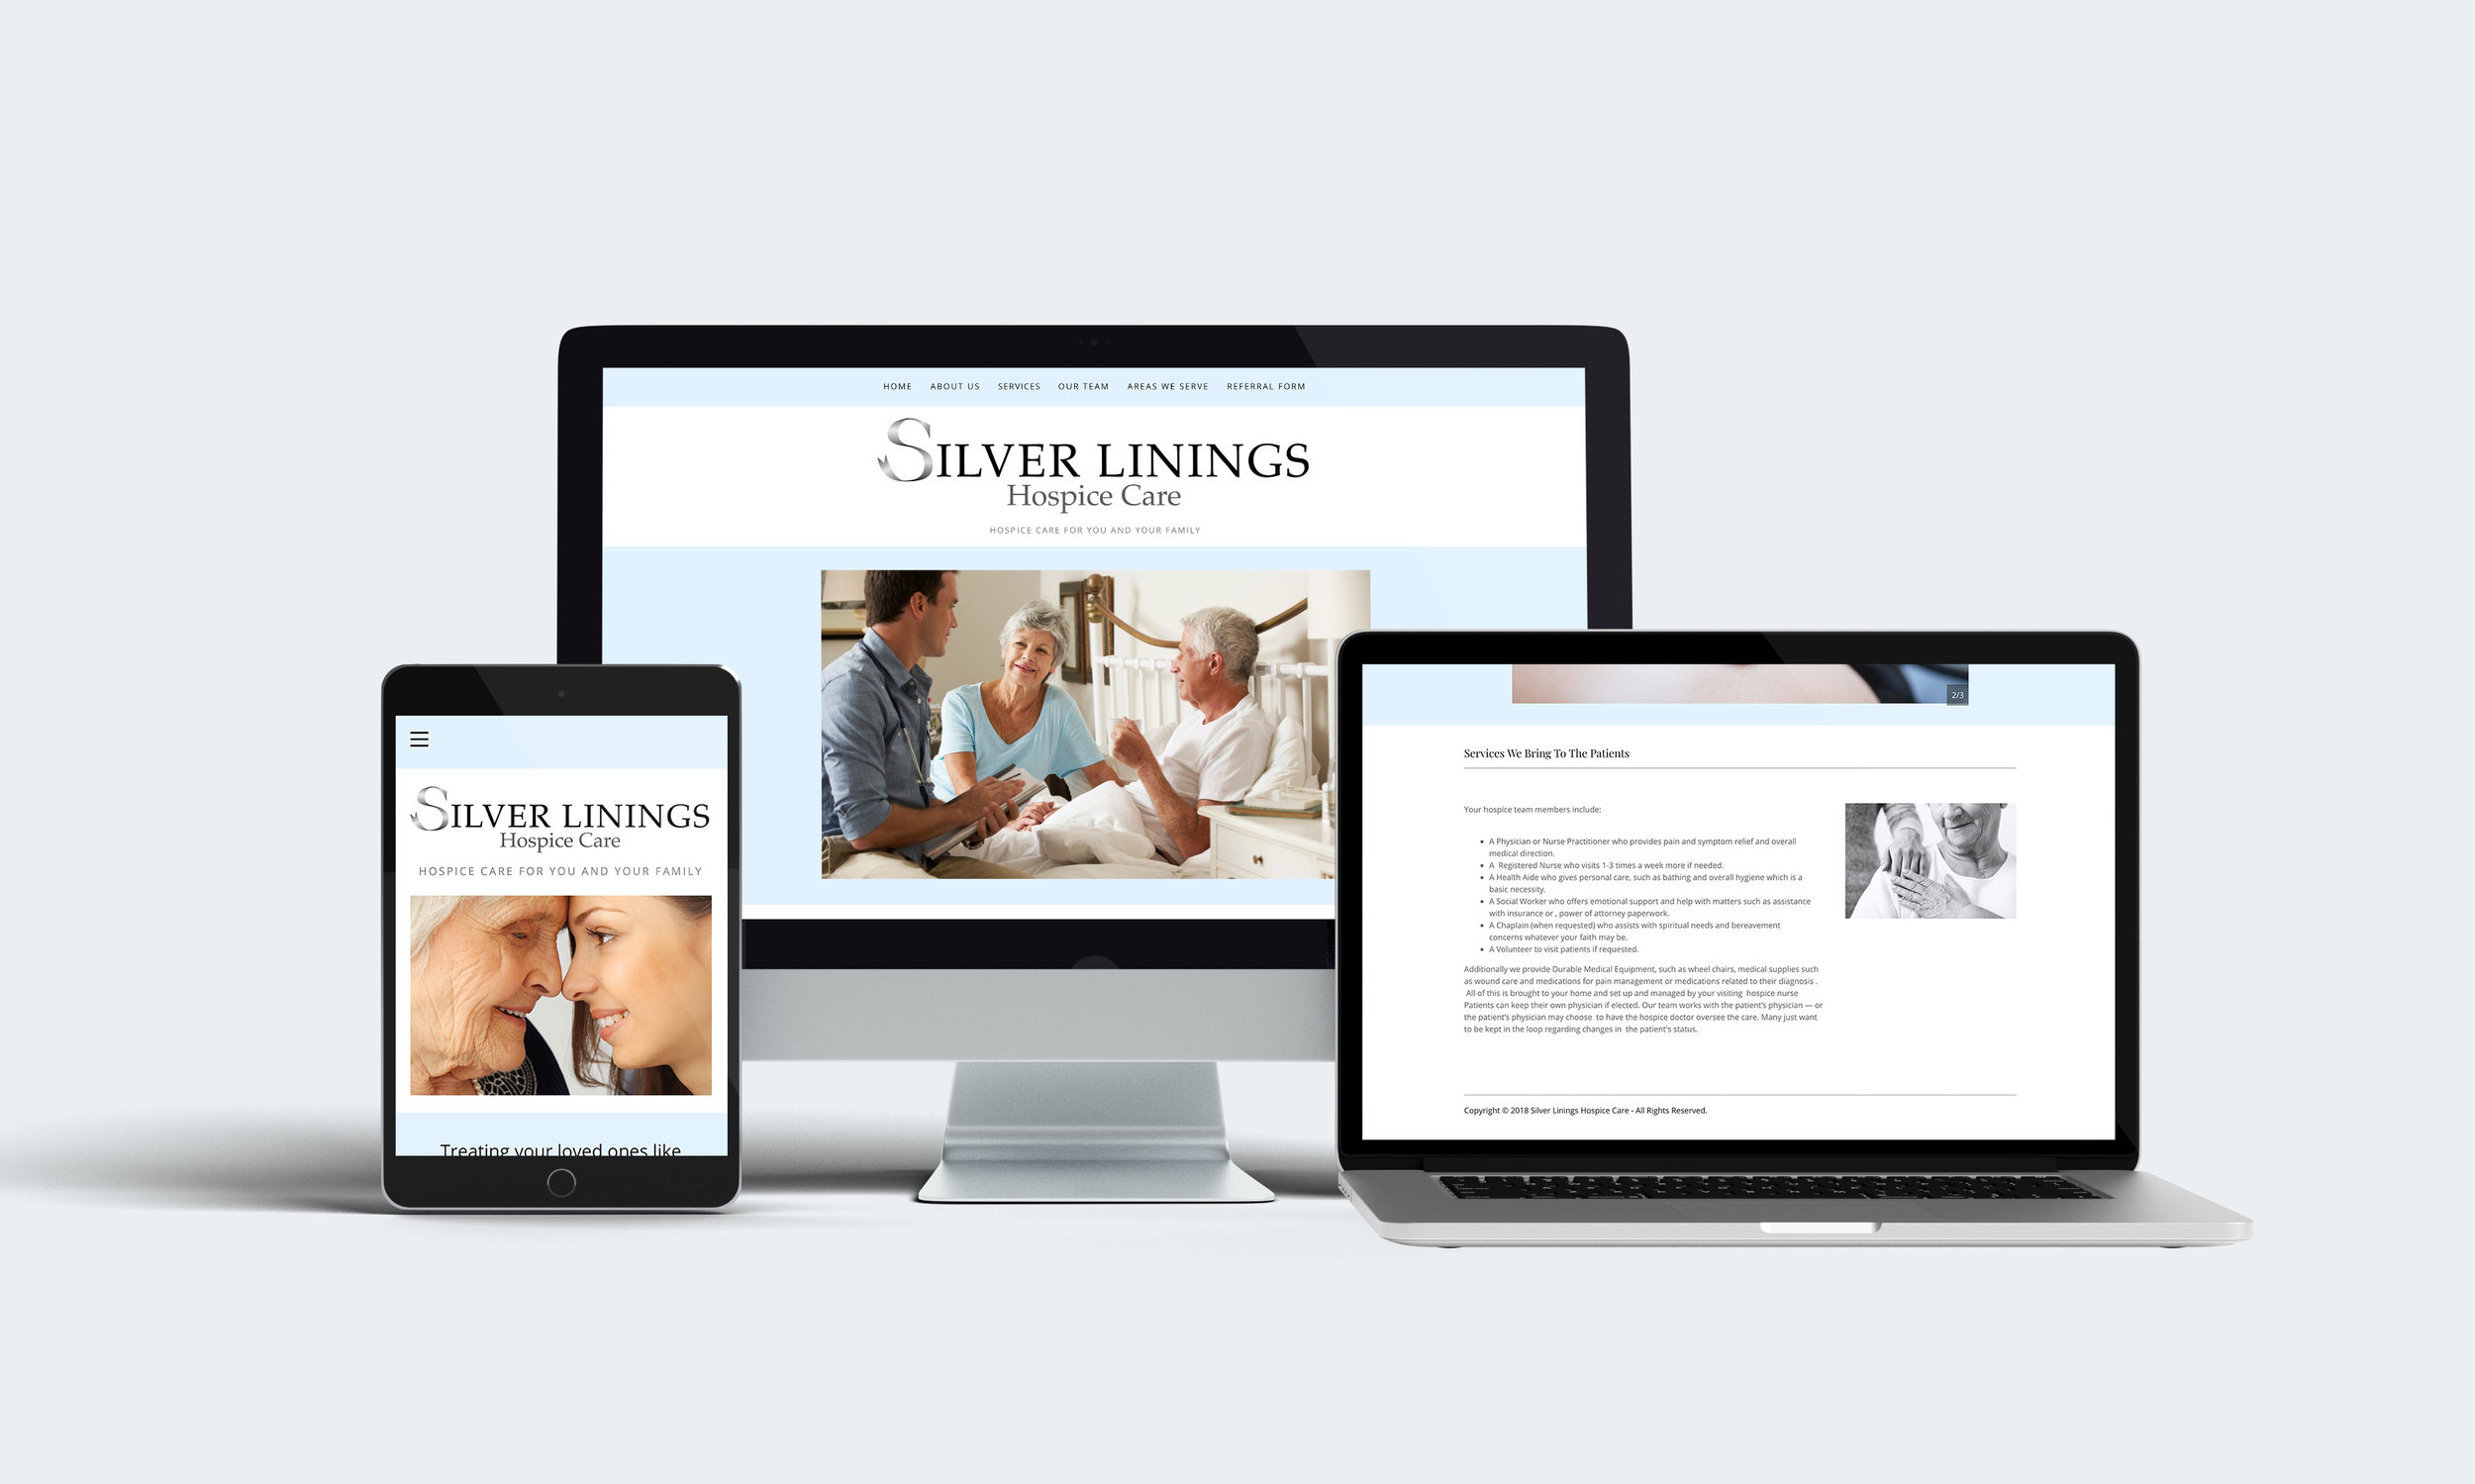 silverliningshospice_web.jpg